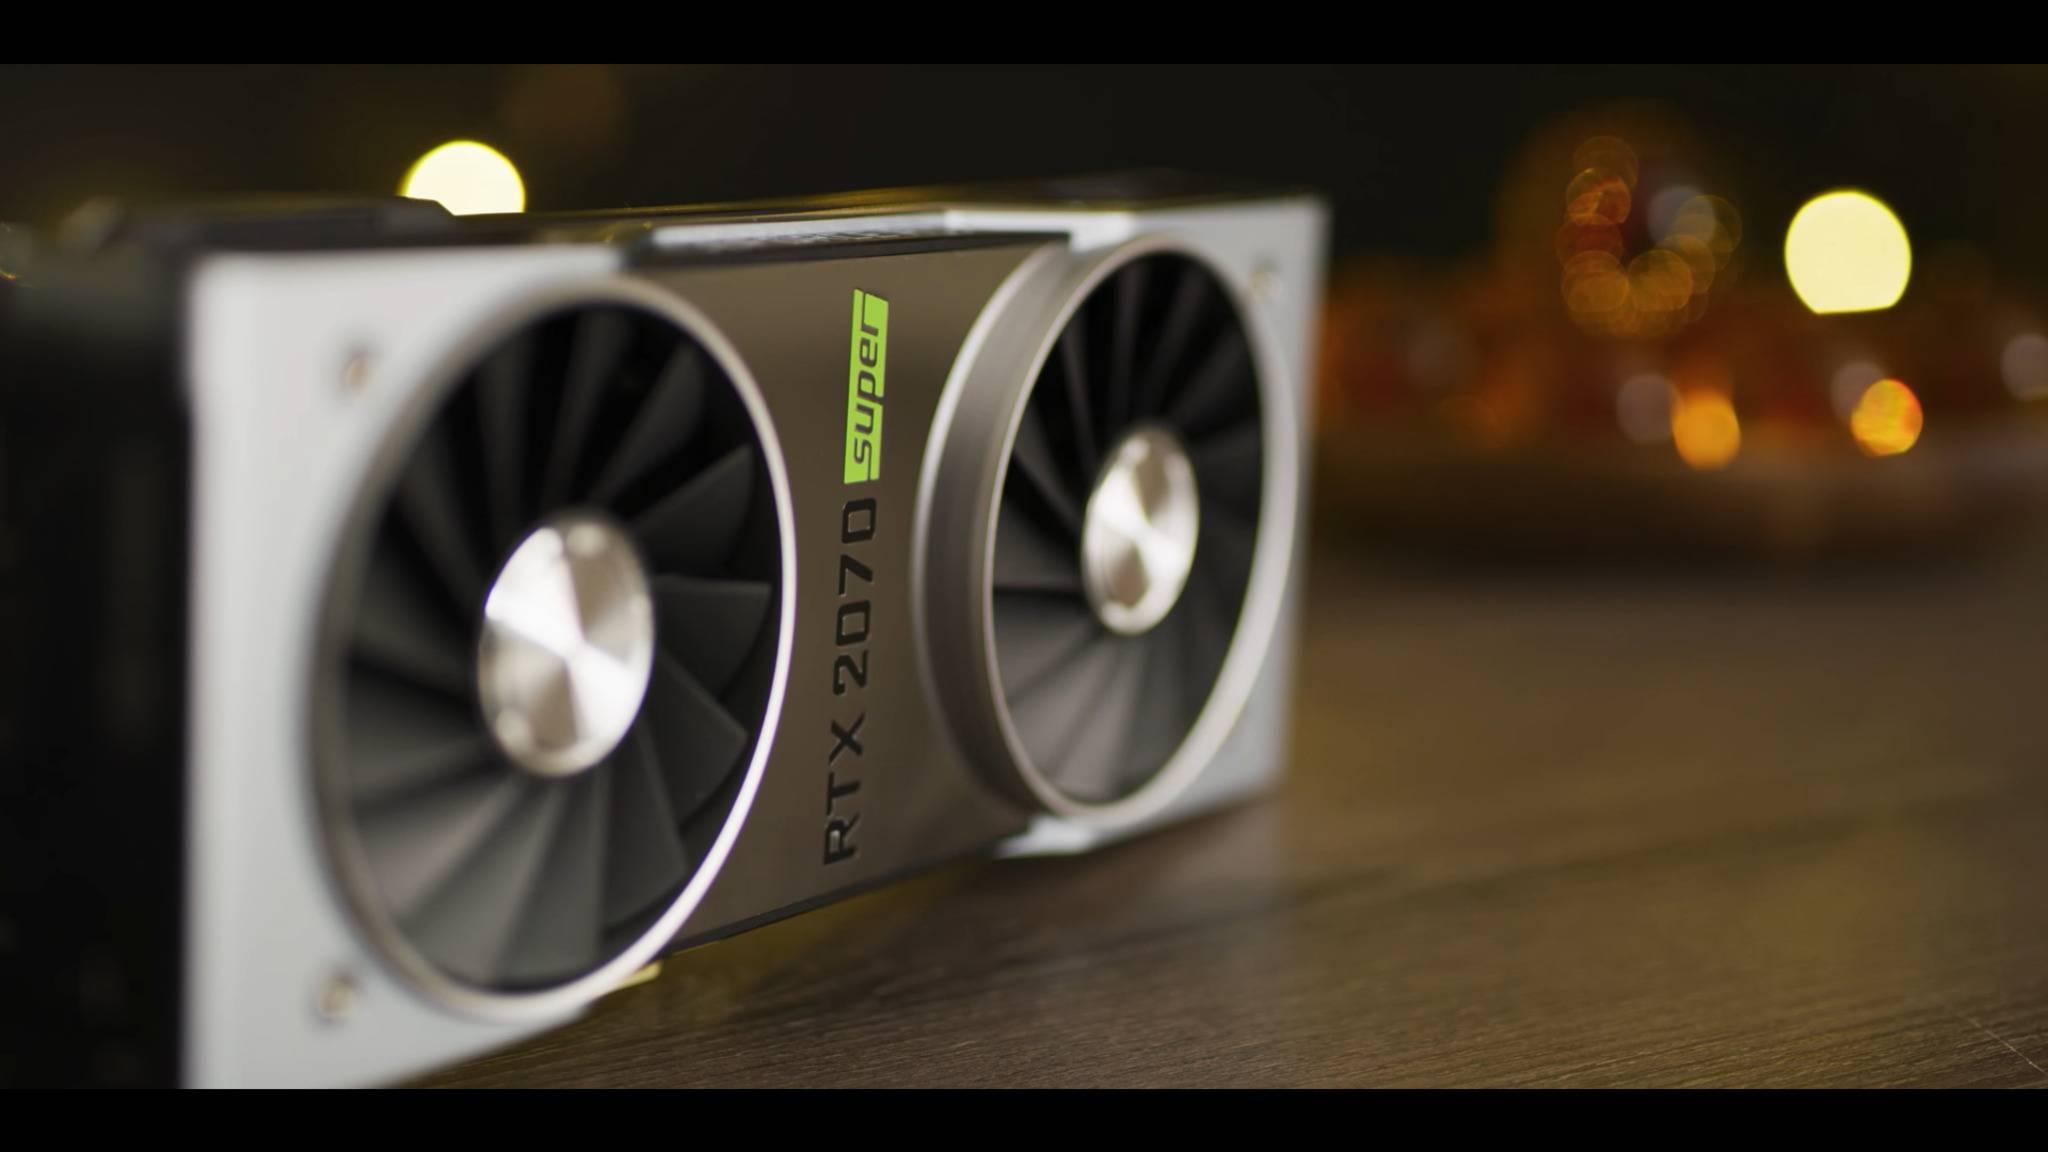 Mit den RTX-Super-Grafikkarten setzt Nvidia den neuen AMD-Karten etwas entgegen.